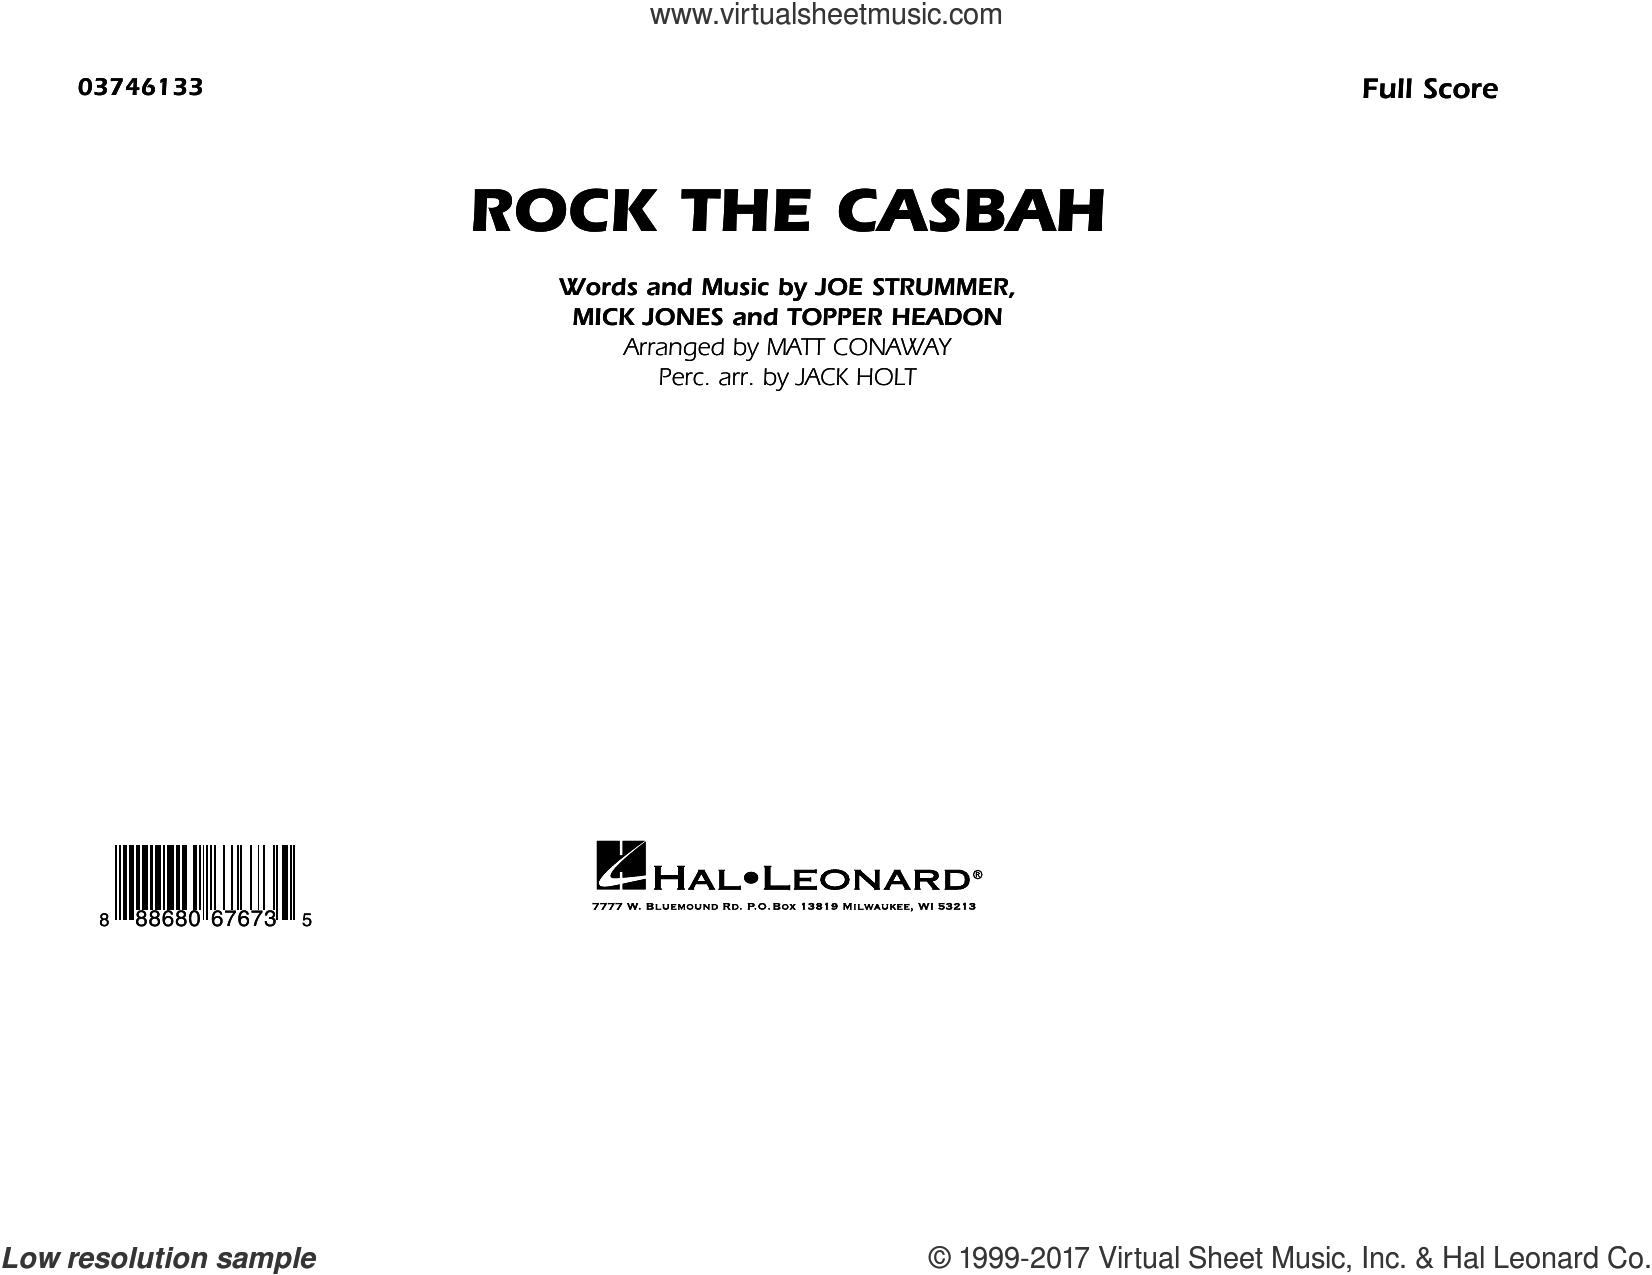 Rock the Casbah (COMPLETE) sheet music for marching band by The Clash, Jack Holt, Joe Strummer, Matt Conaway, Mick Jones and Topper Headon, intermediate skill level